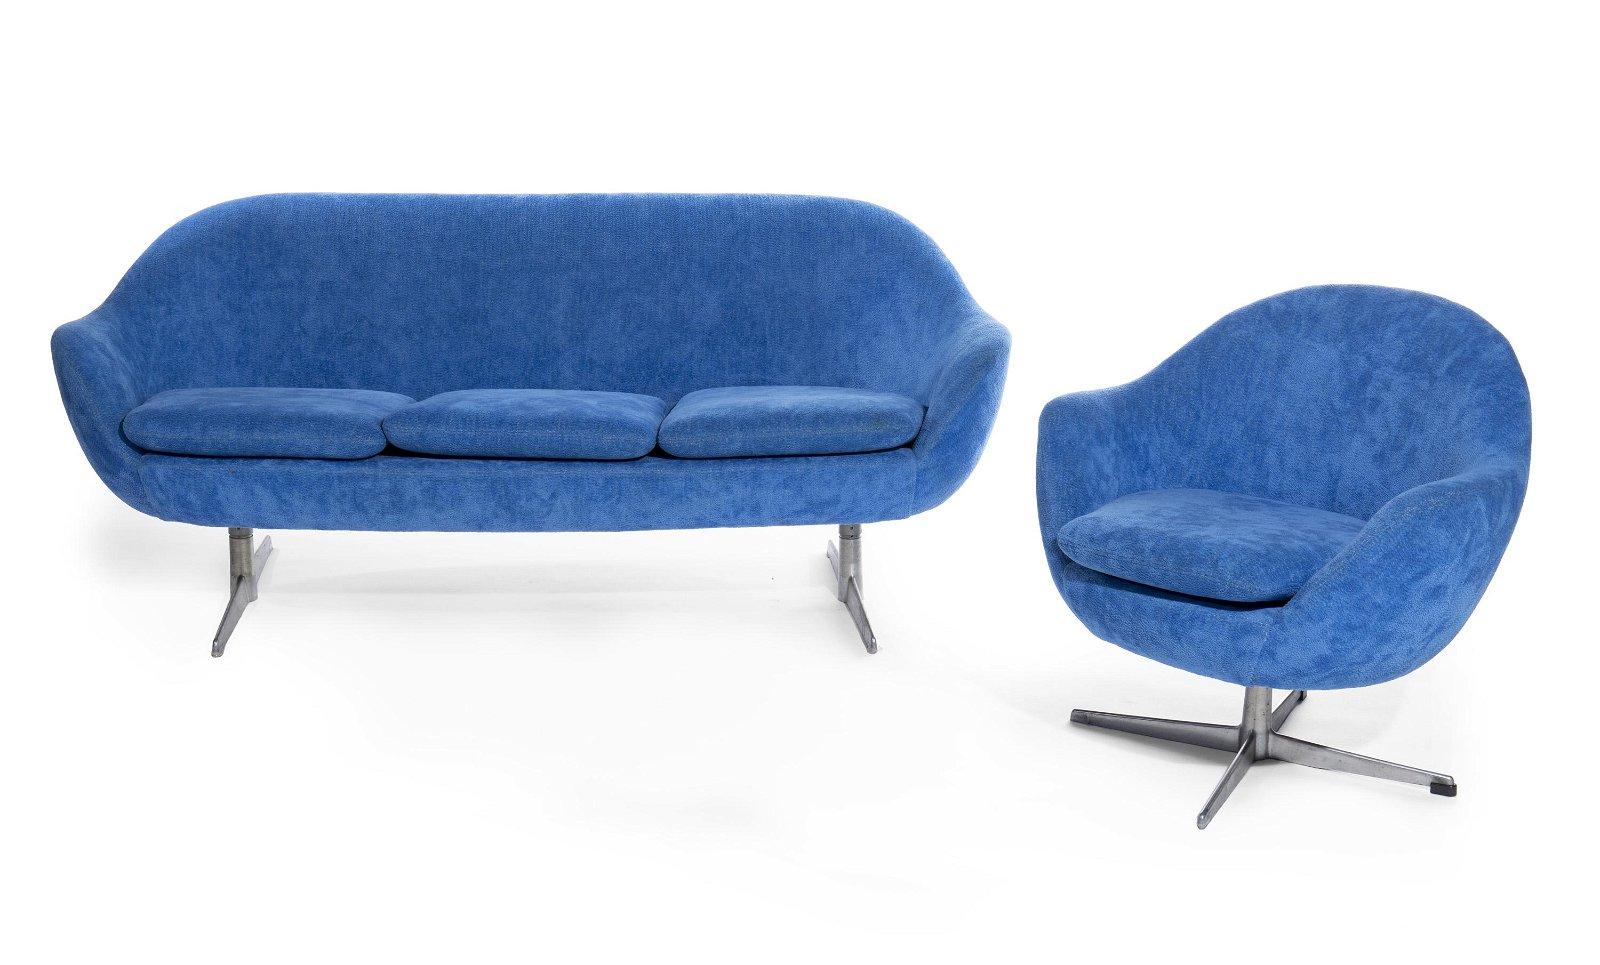 A custom blue upholstered sofa and armchair